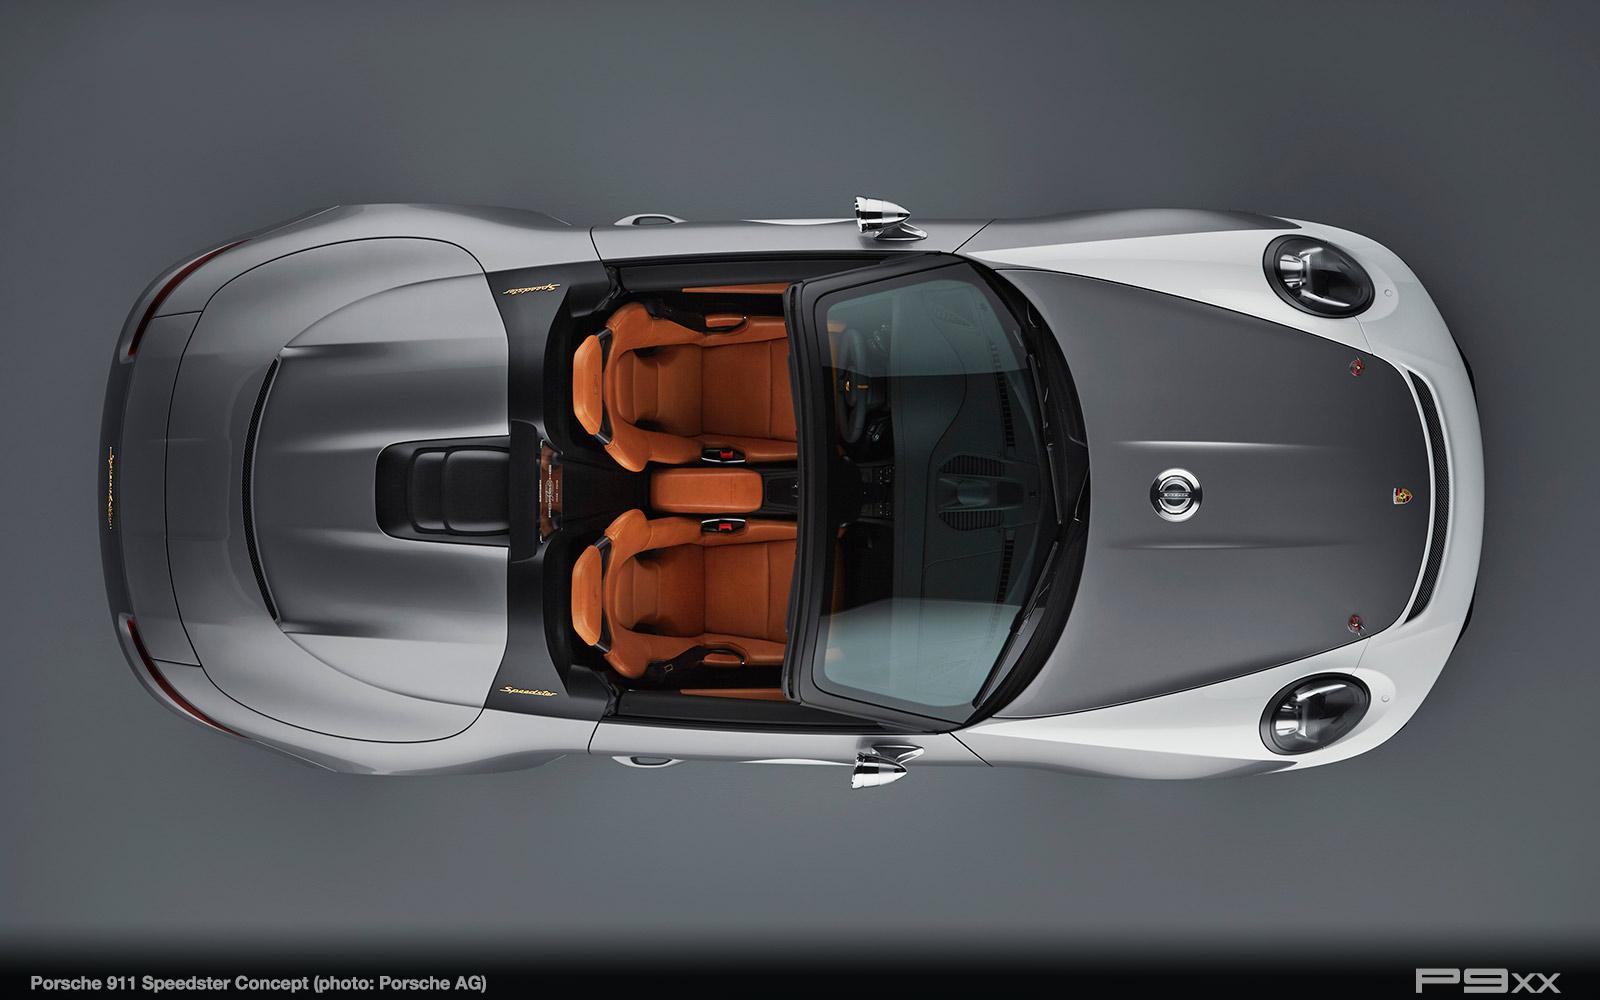 Porsche-911-Speedster-Concept-2018-305